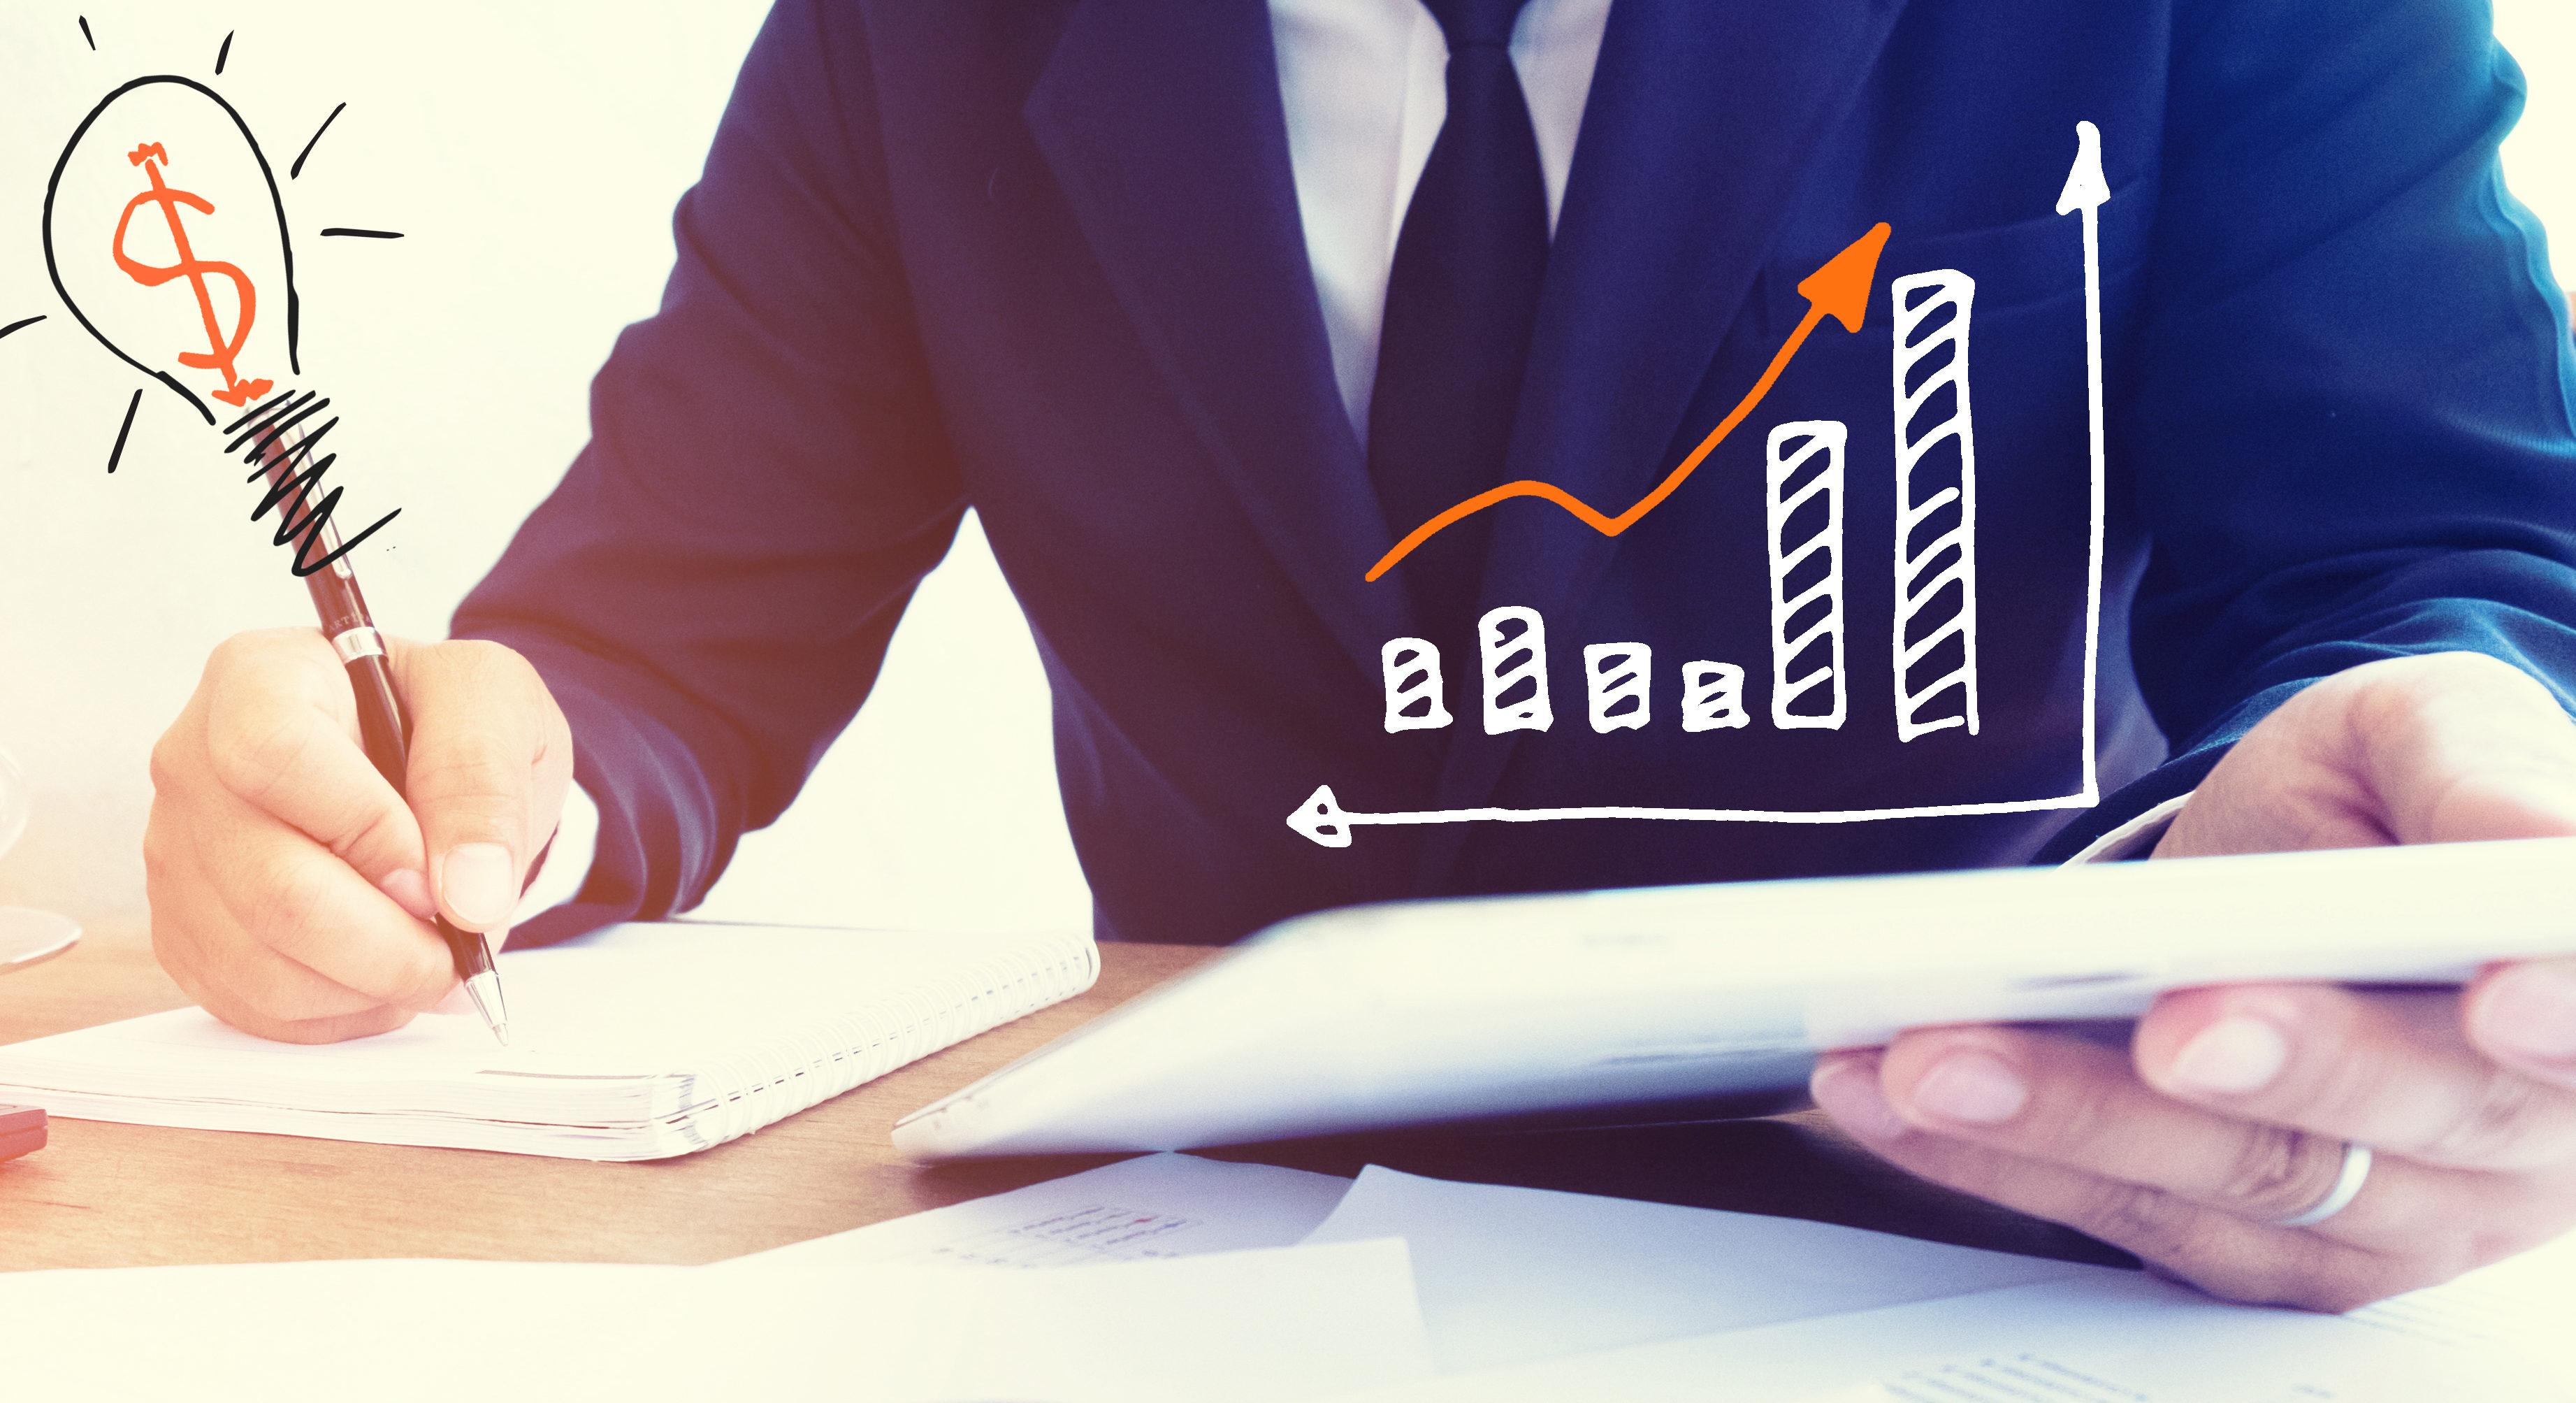 Tom Brough - Capital Trust Wealth Management image 4